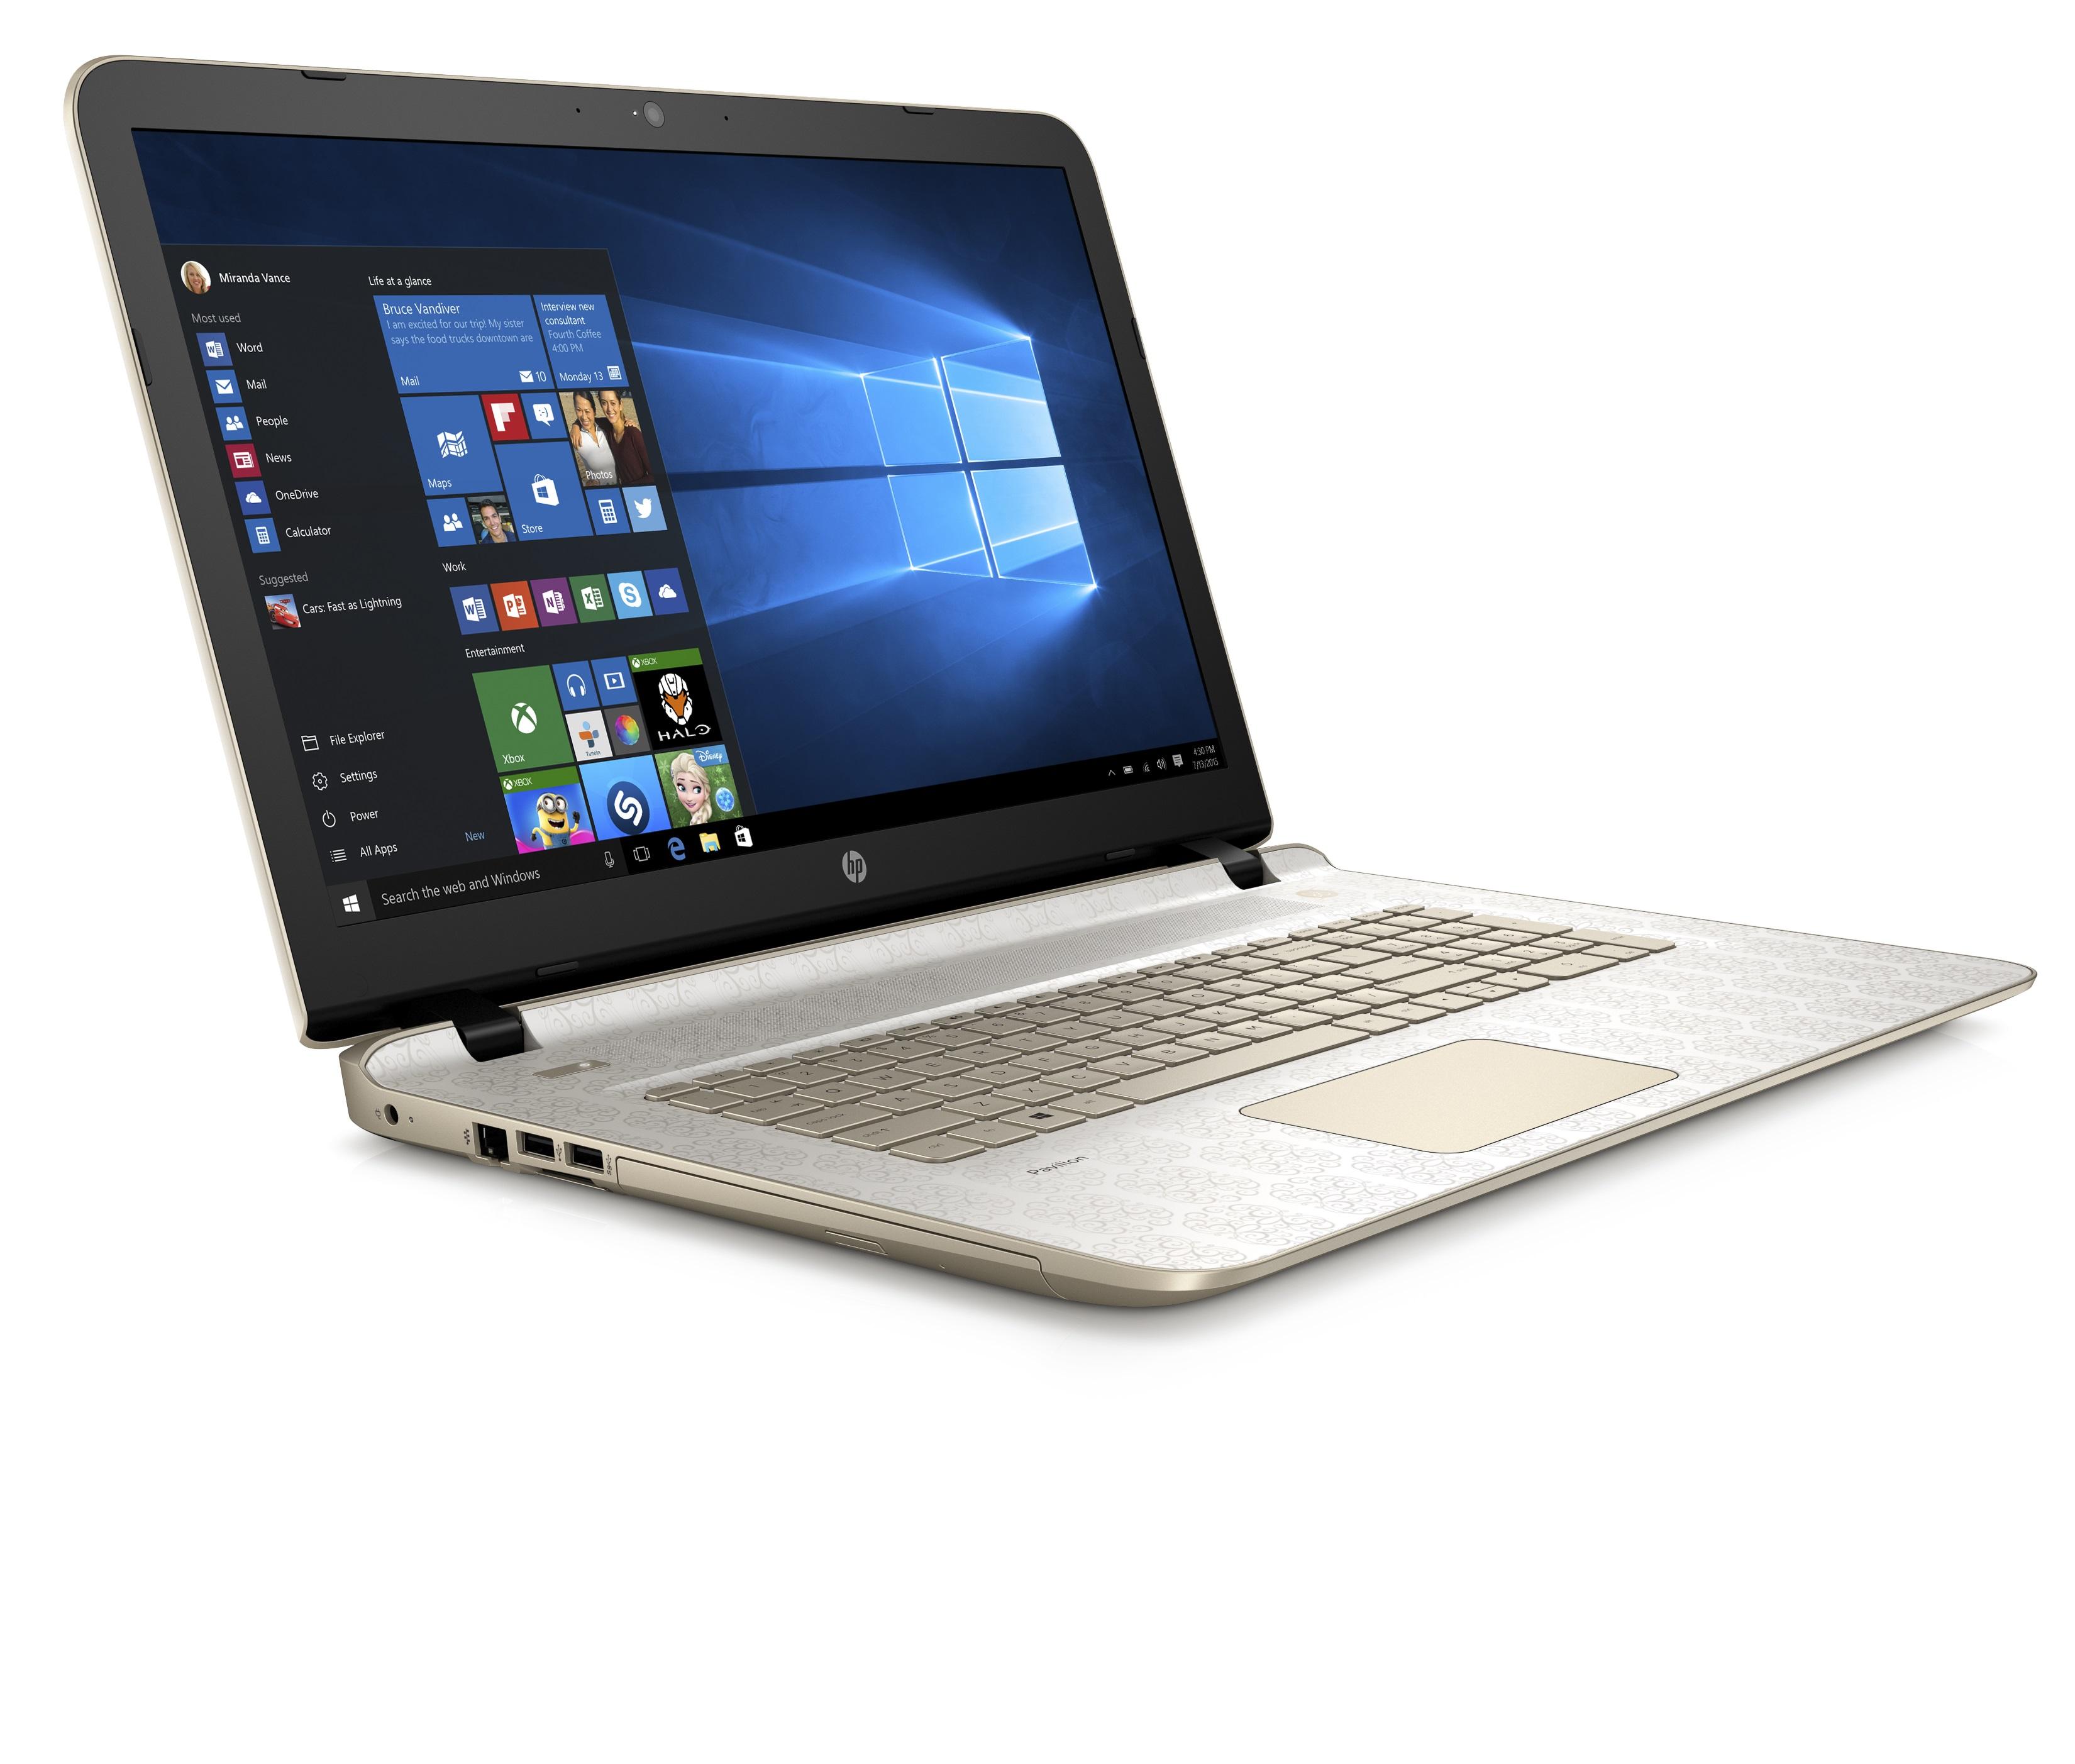 HP Pavilion 17-g205cy AMD HD Graphics 64 Bit